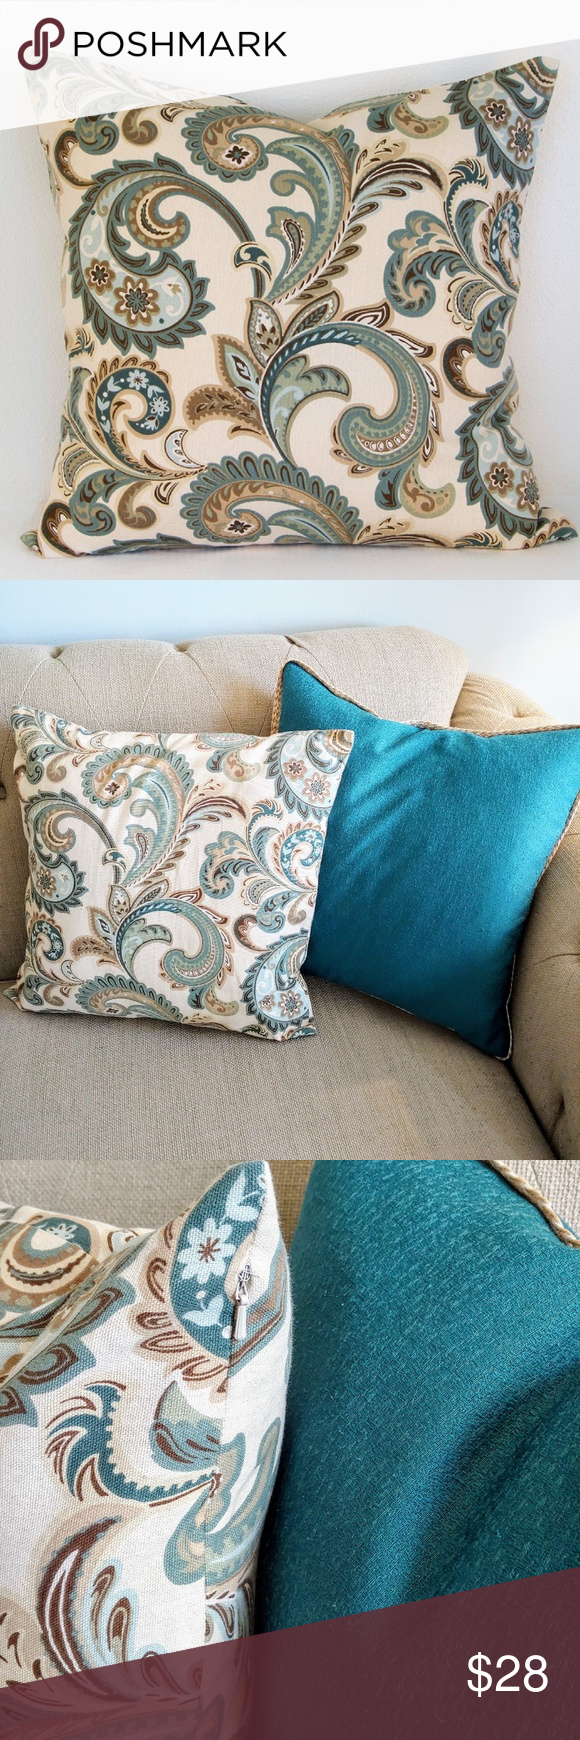 Pillow set paisley print 20x20 Paisley print pillow cover with invisible zipper. Pillow set